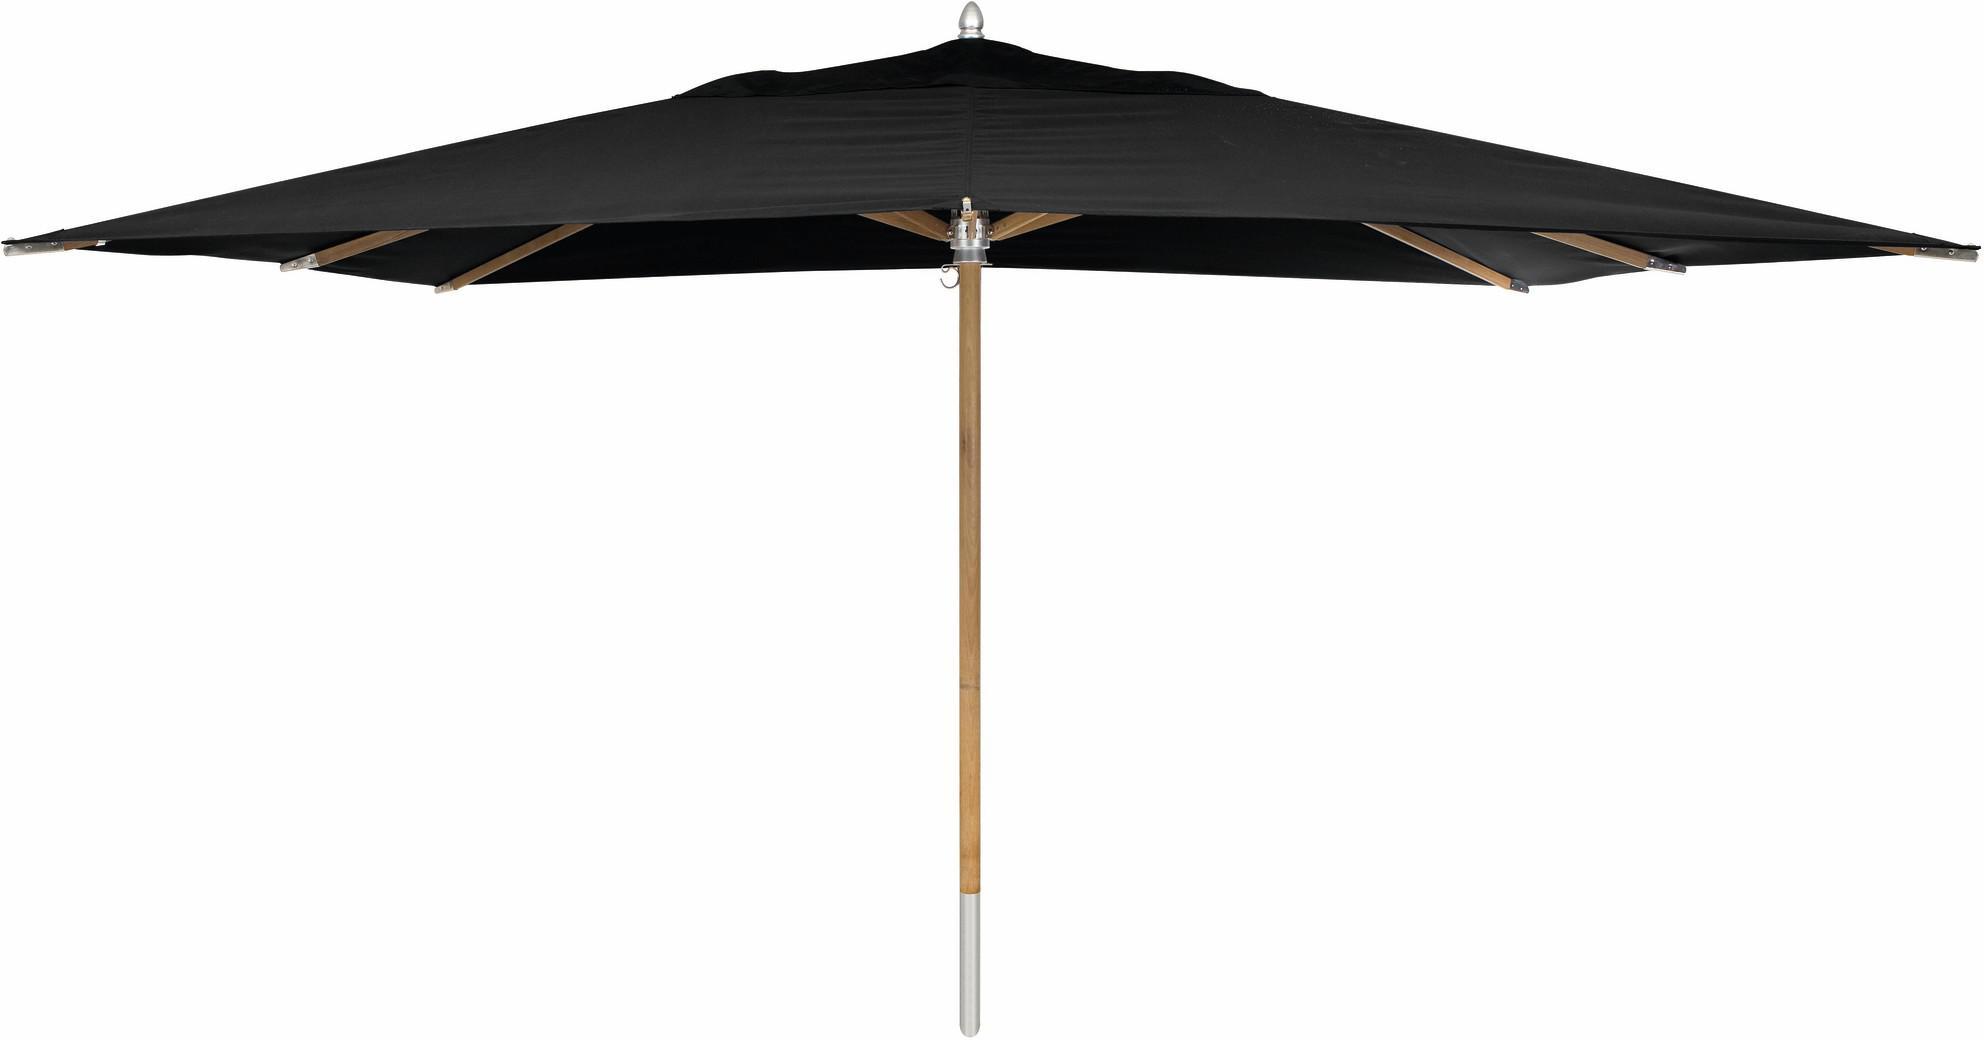 Umbrella central pole teak 300*400 black